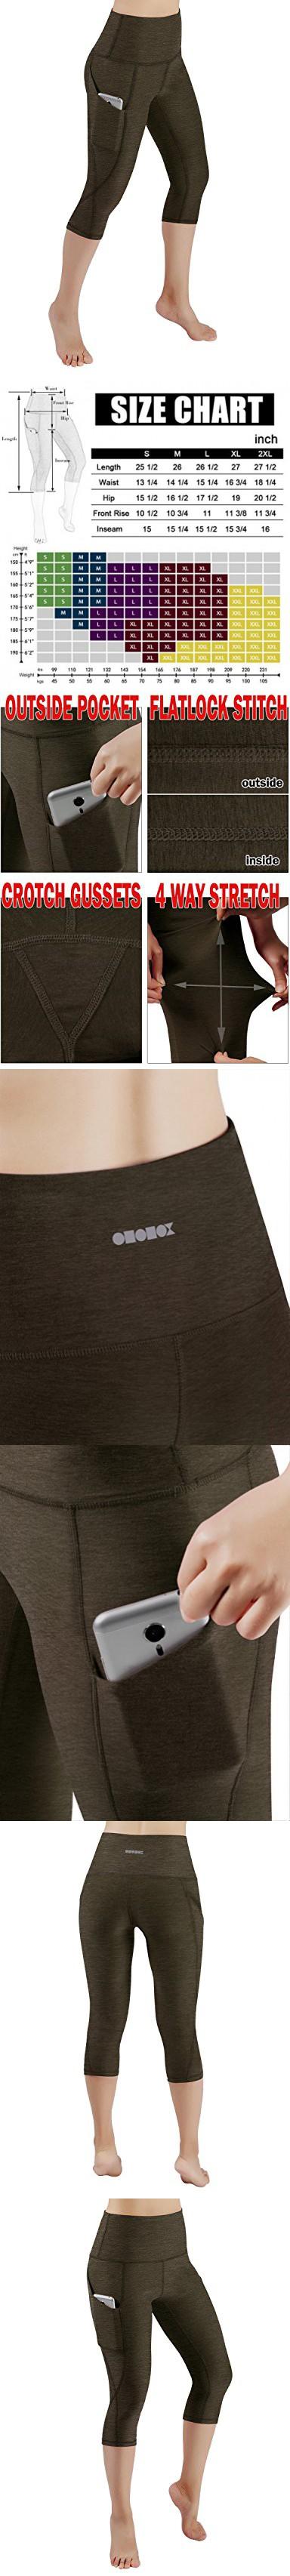 5758cbf29c57b7 ODODOS High Waist Out Pocket Yoga Capris Pants Tummy Control Workout  Running 4 way Stretch Yoga Capris Leggings,Olive,X-Large